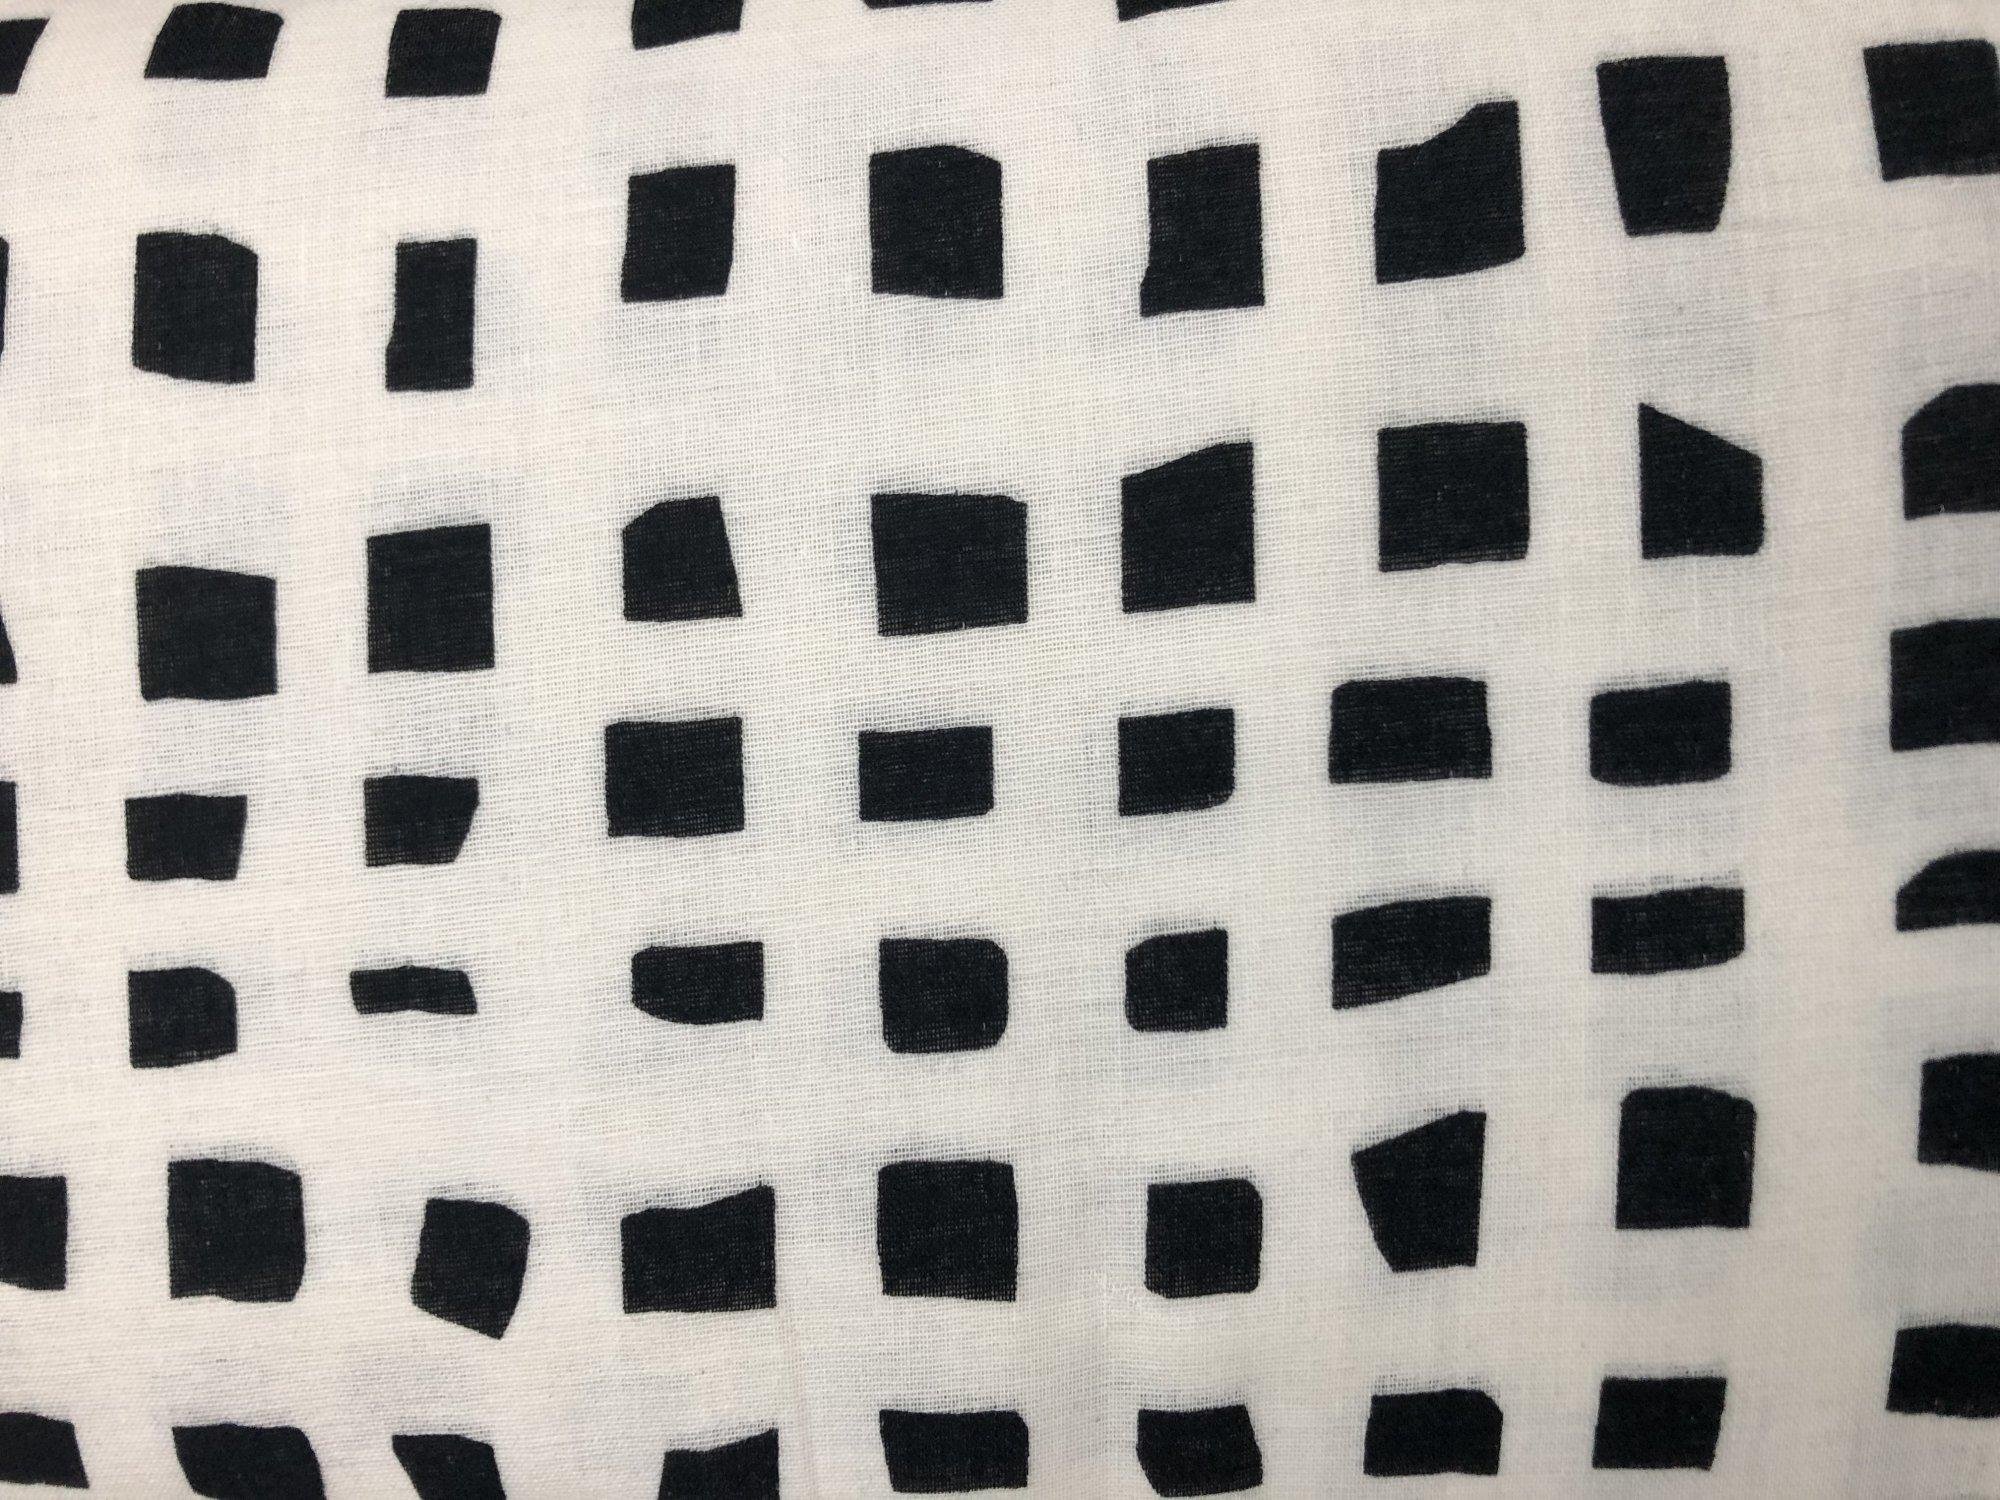 DG White/Black Squares